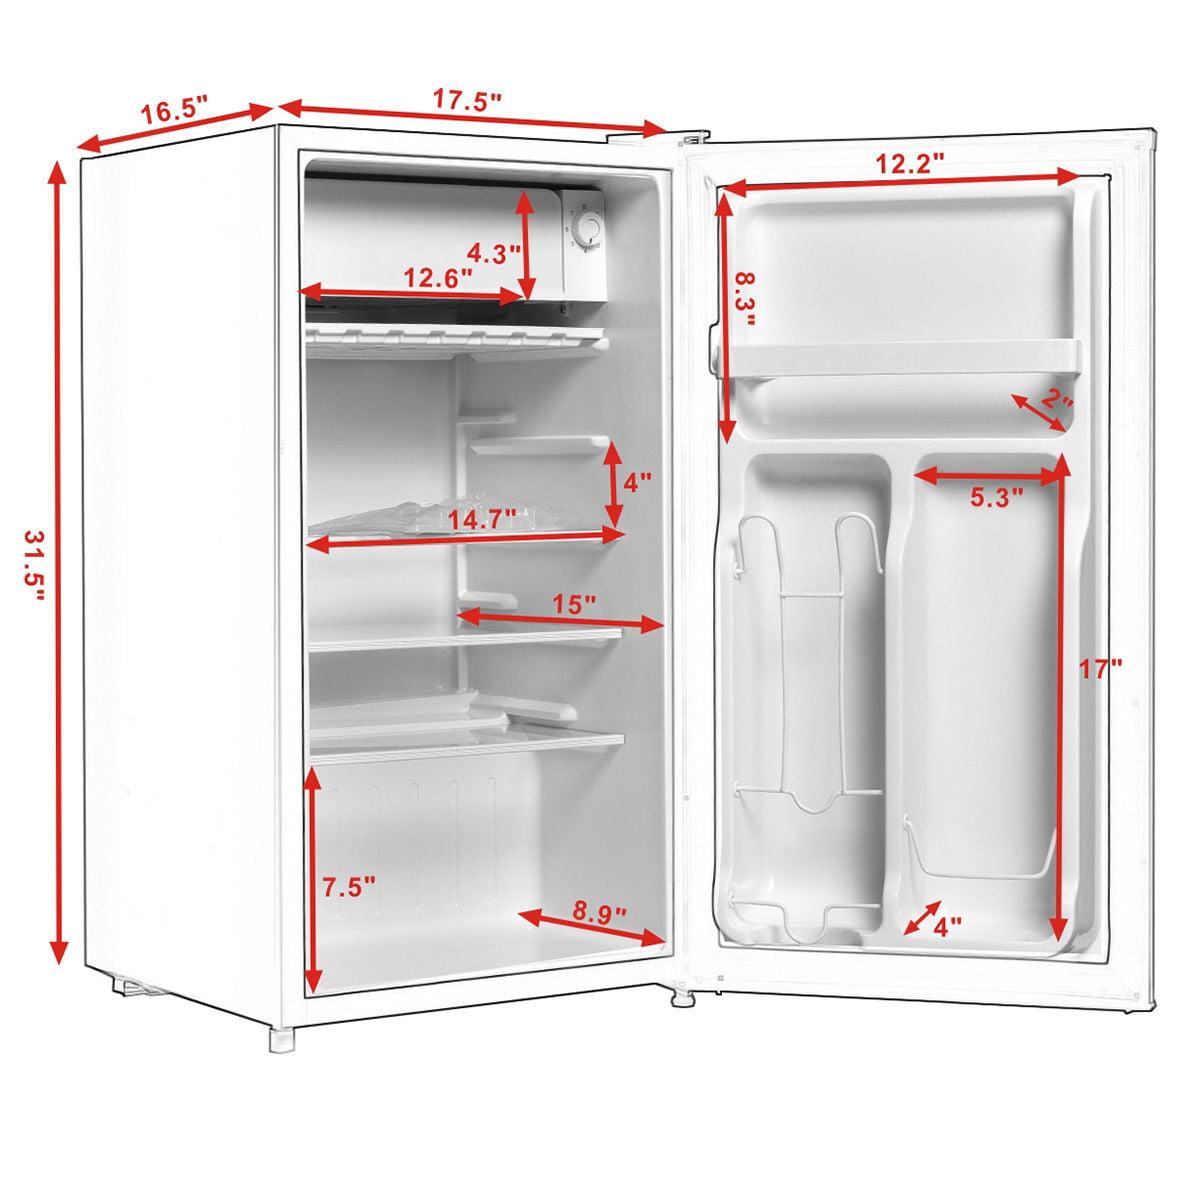 5156b3eaea4 Costway Stainless Steel Refrigerator Small Freezer Cooler Fridge Compact 3.2  cu ft. Unit - Walmart.com